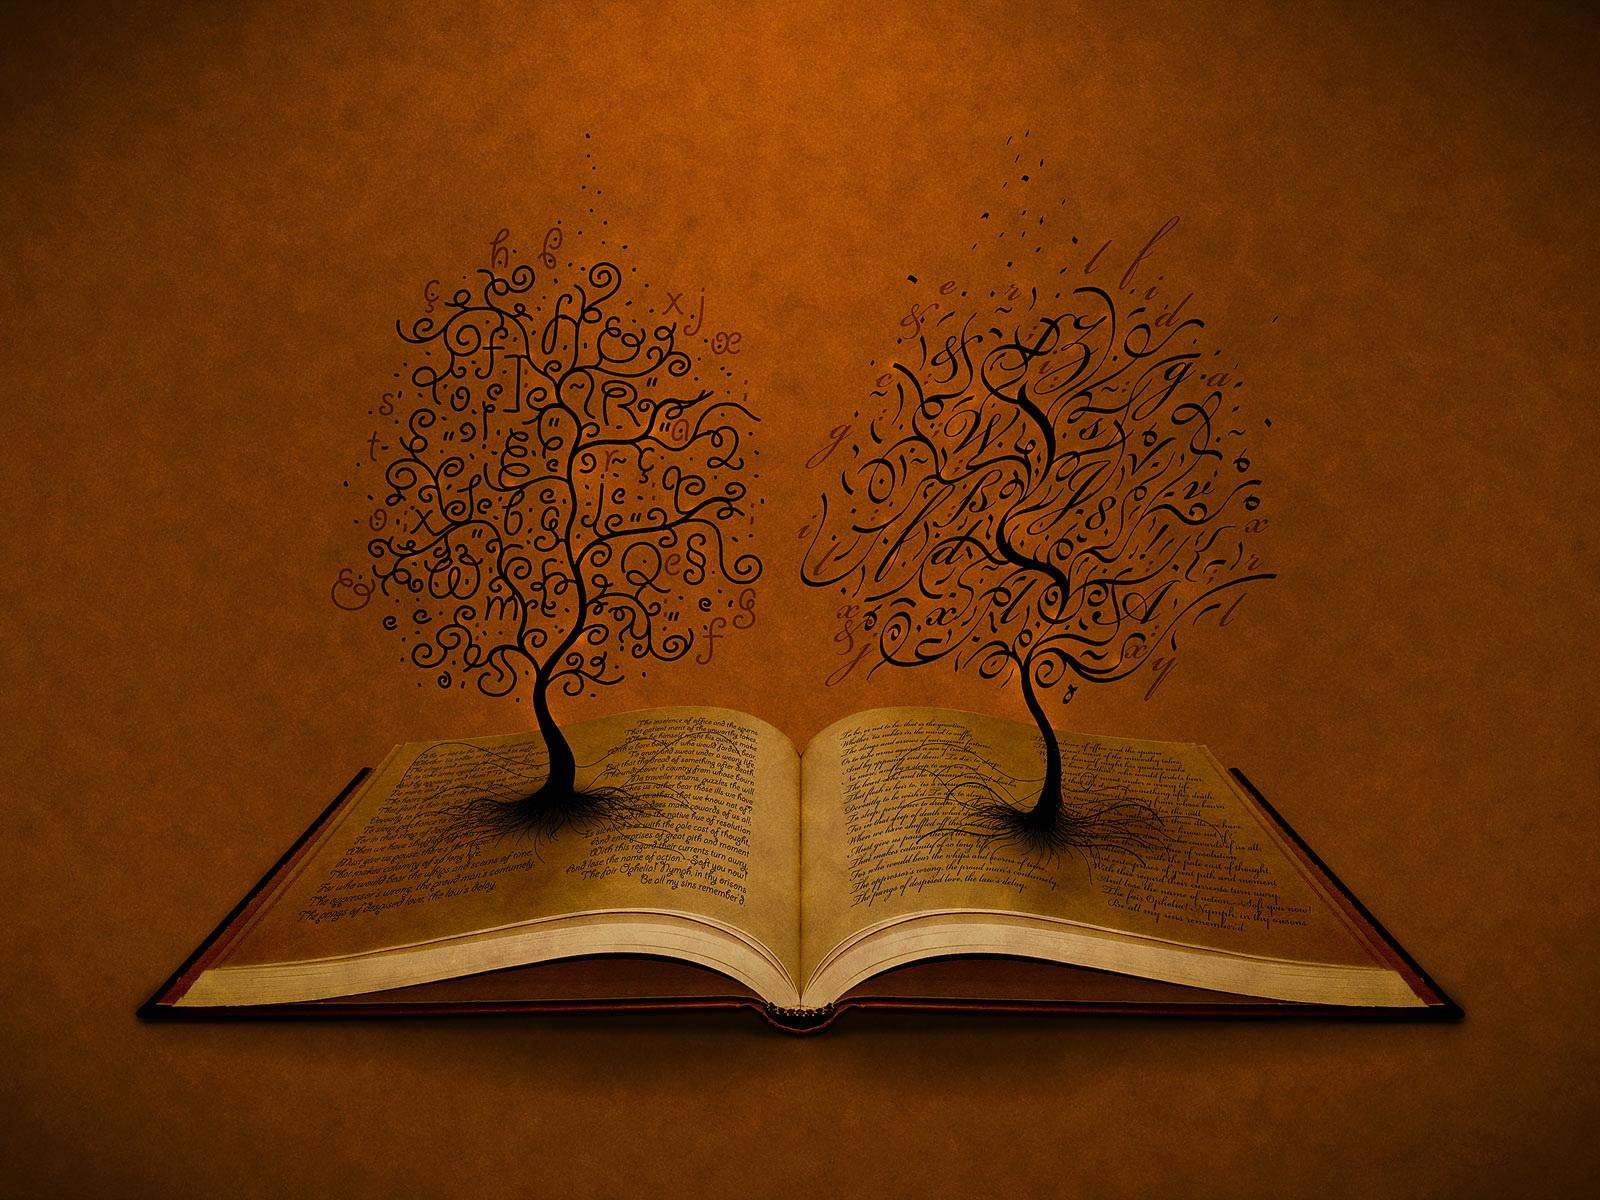 cool book wallpaper 22146